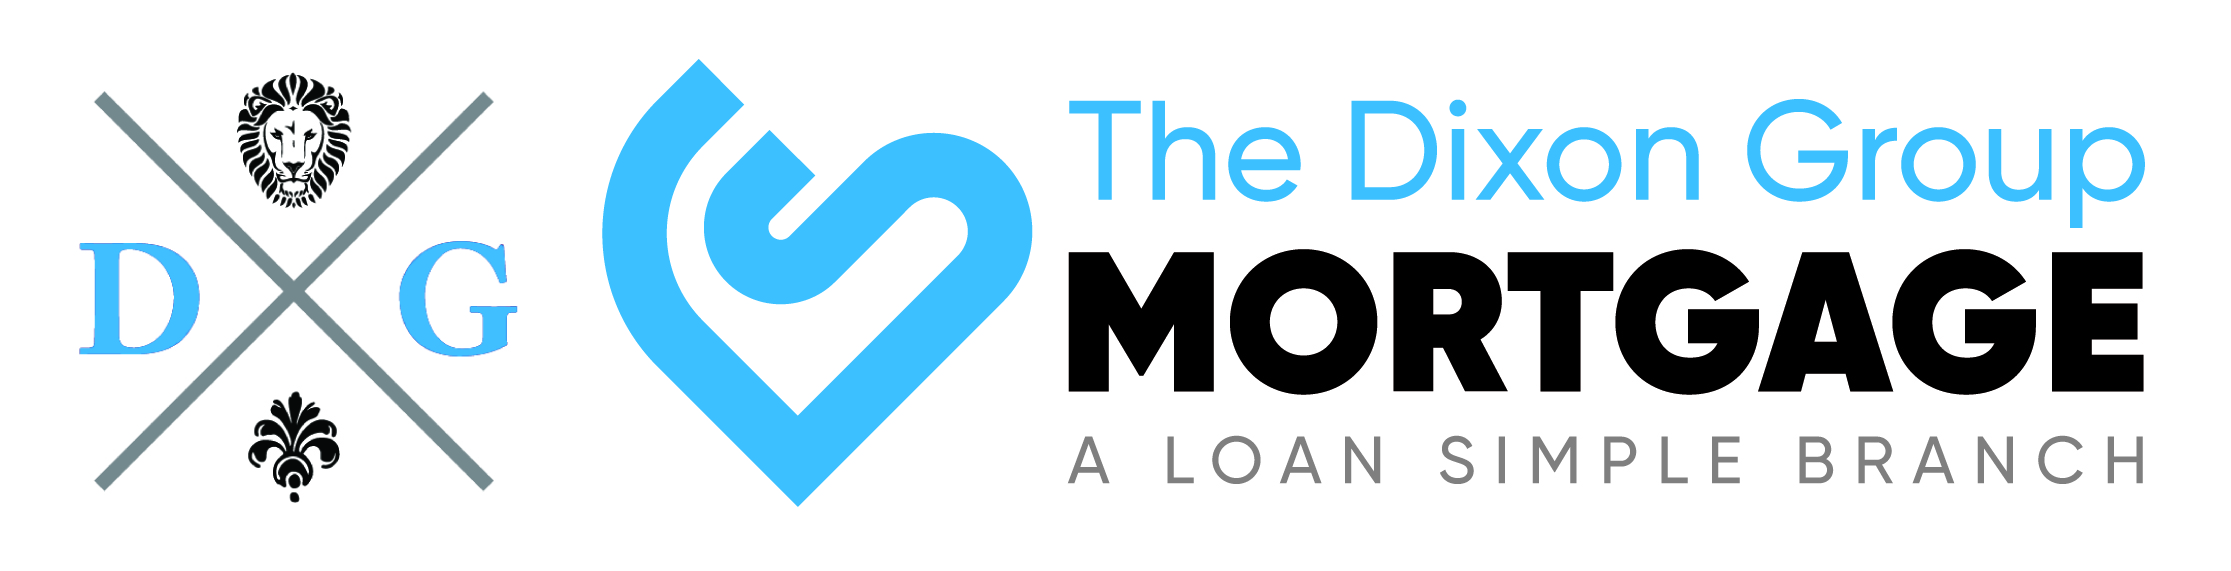 The Dixon Group Mortgage Team logo